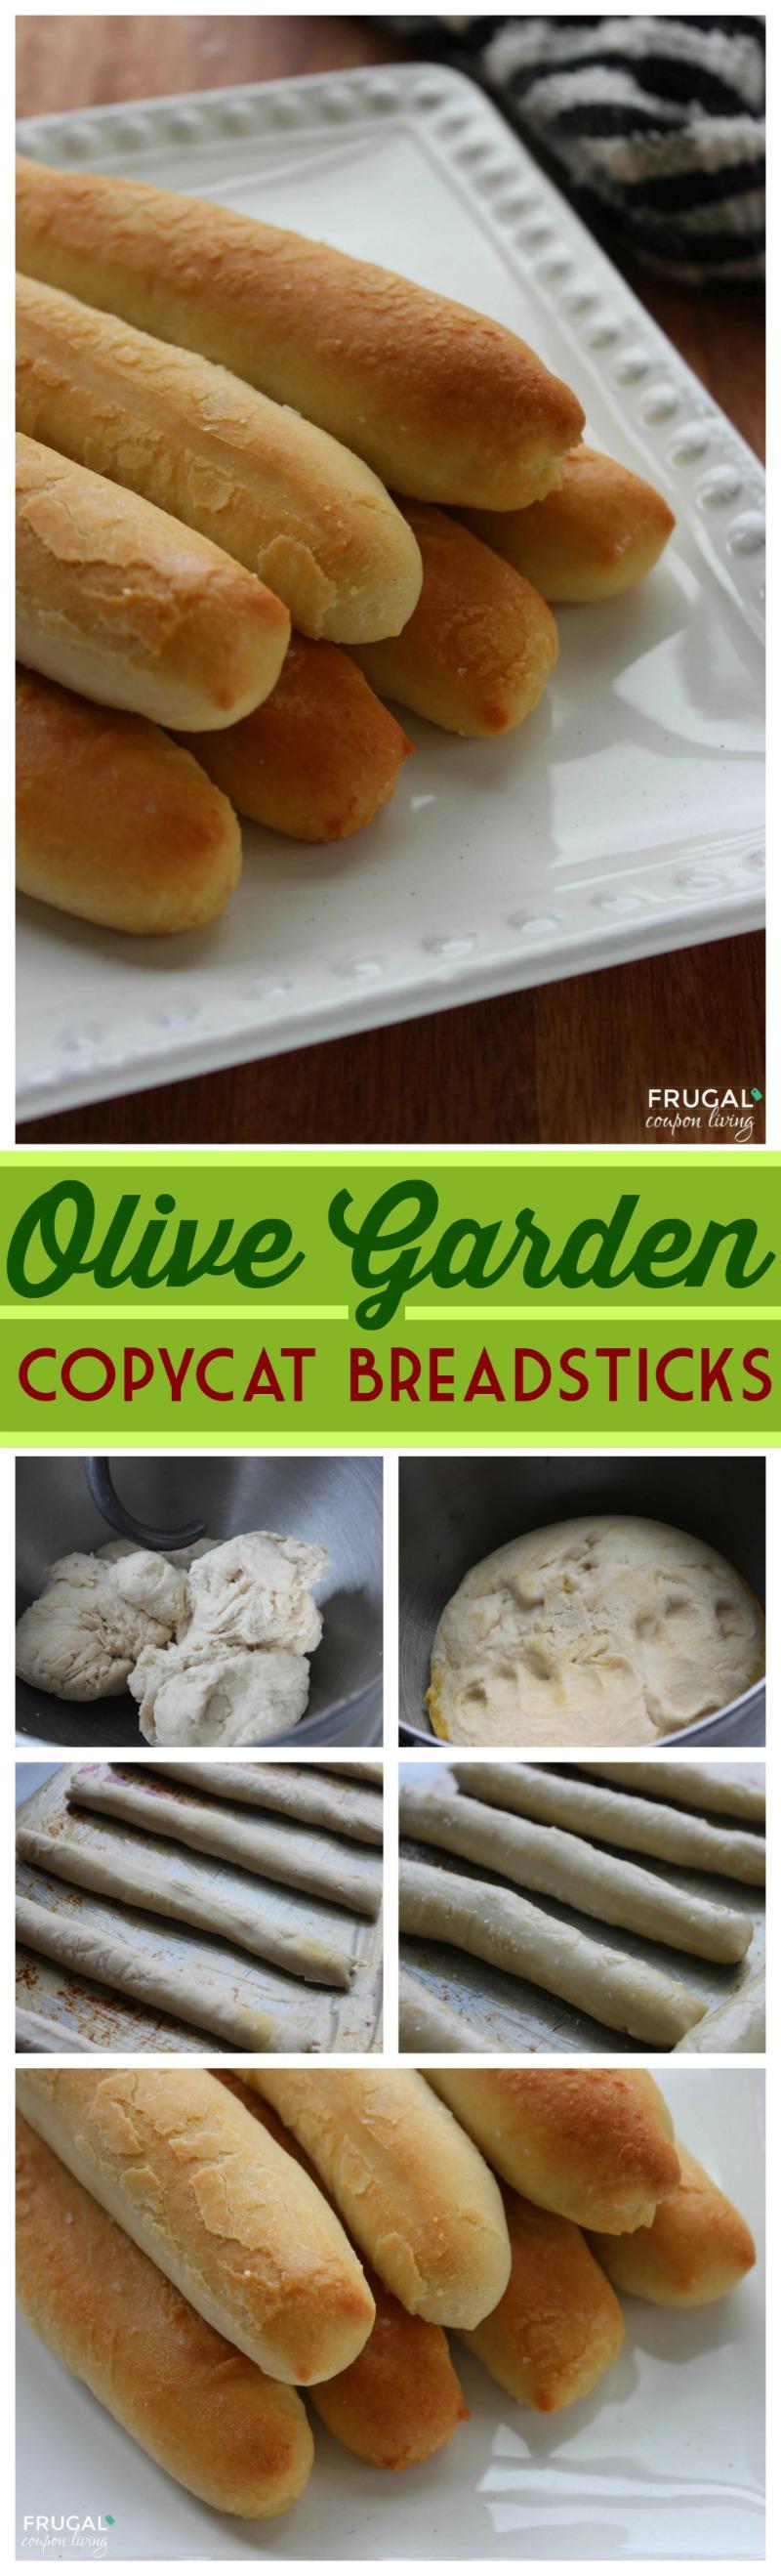 olive-garden-copycat-breadsticks-recipe-collage-frugal-coupon-living